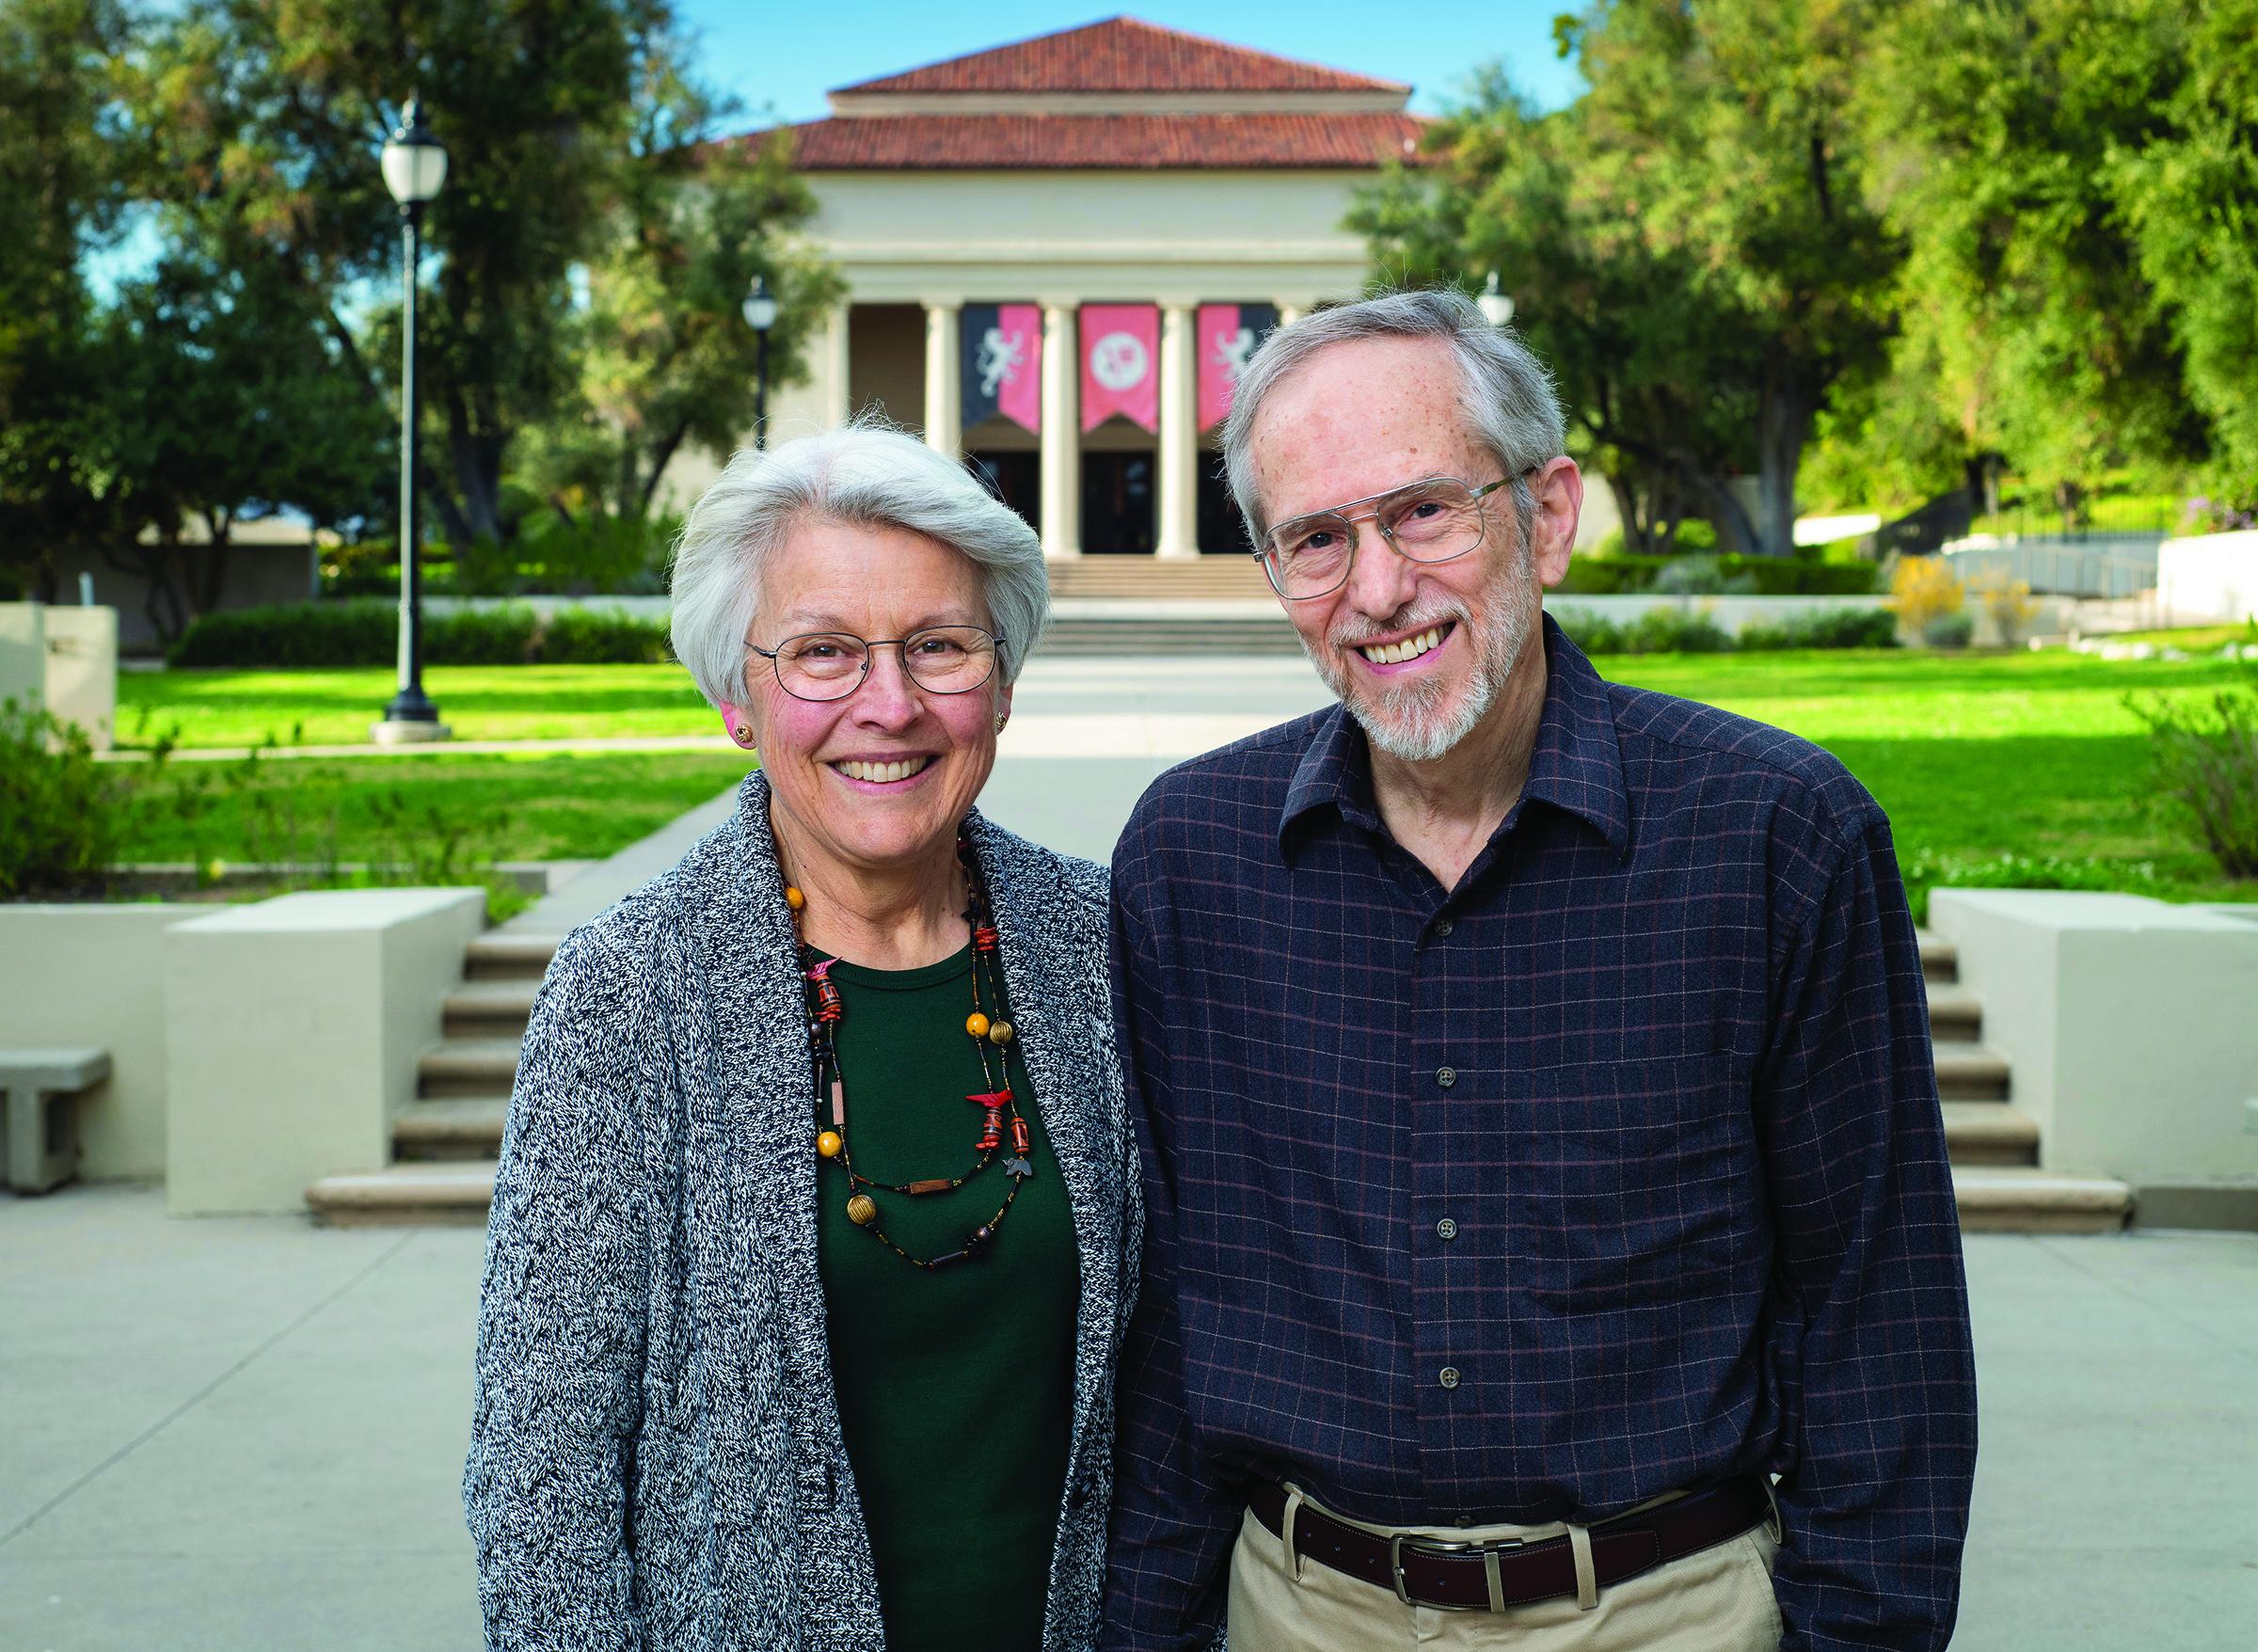 Karen and Steve Casner